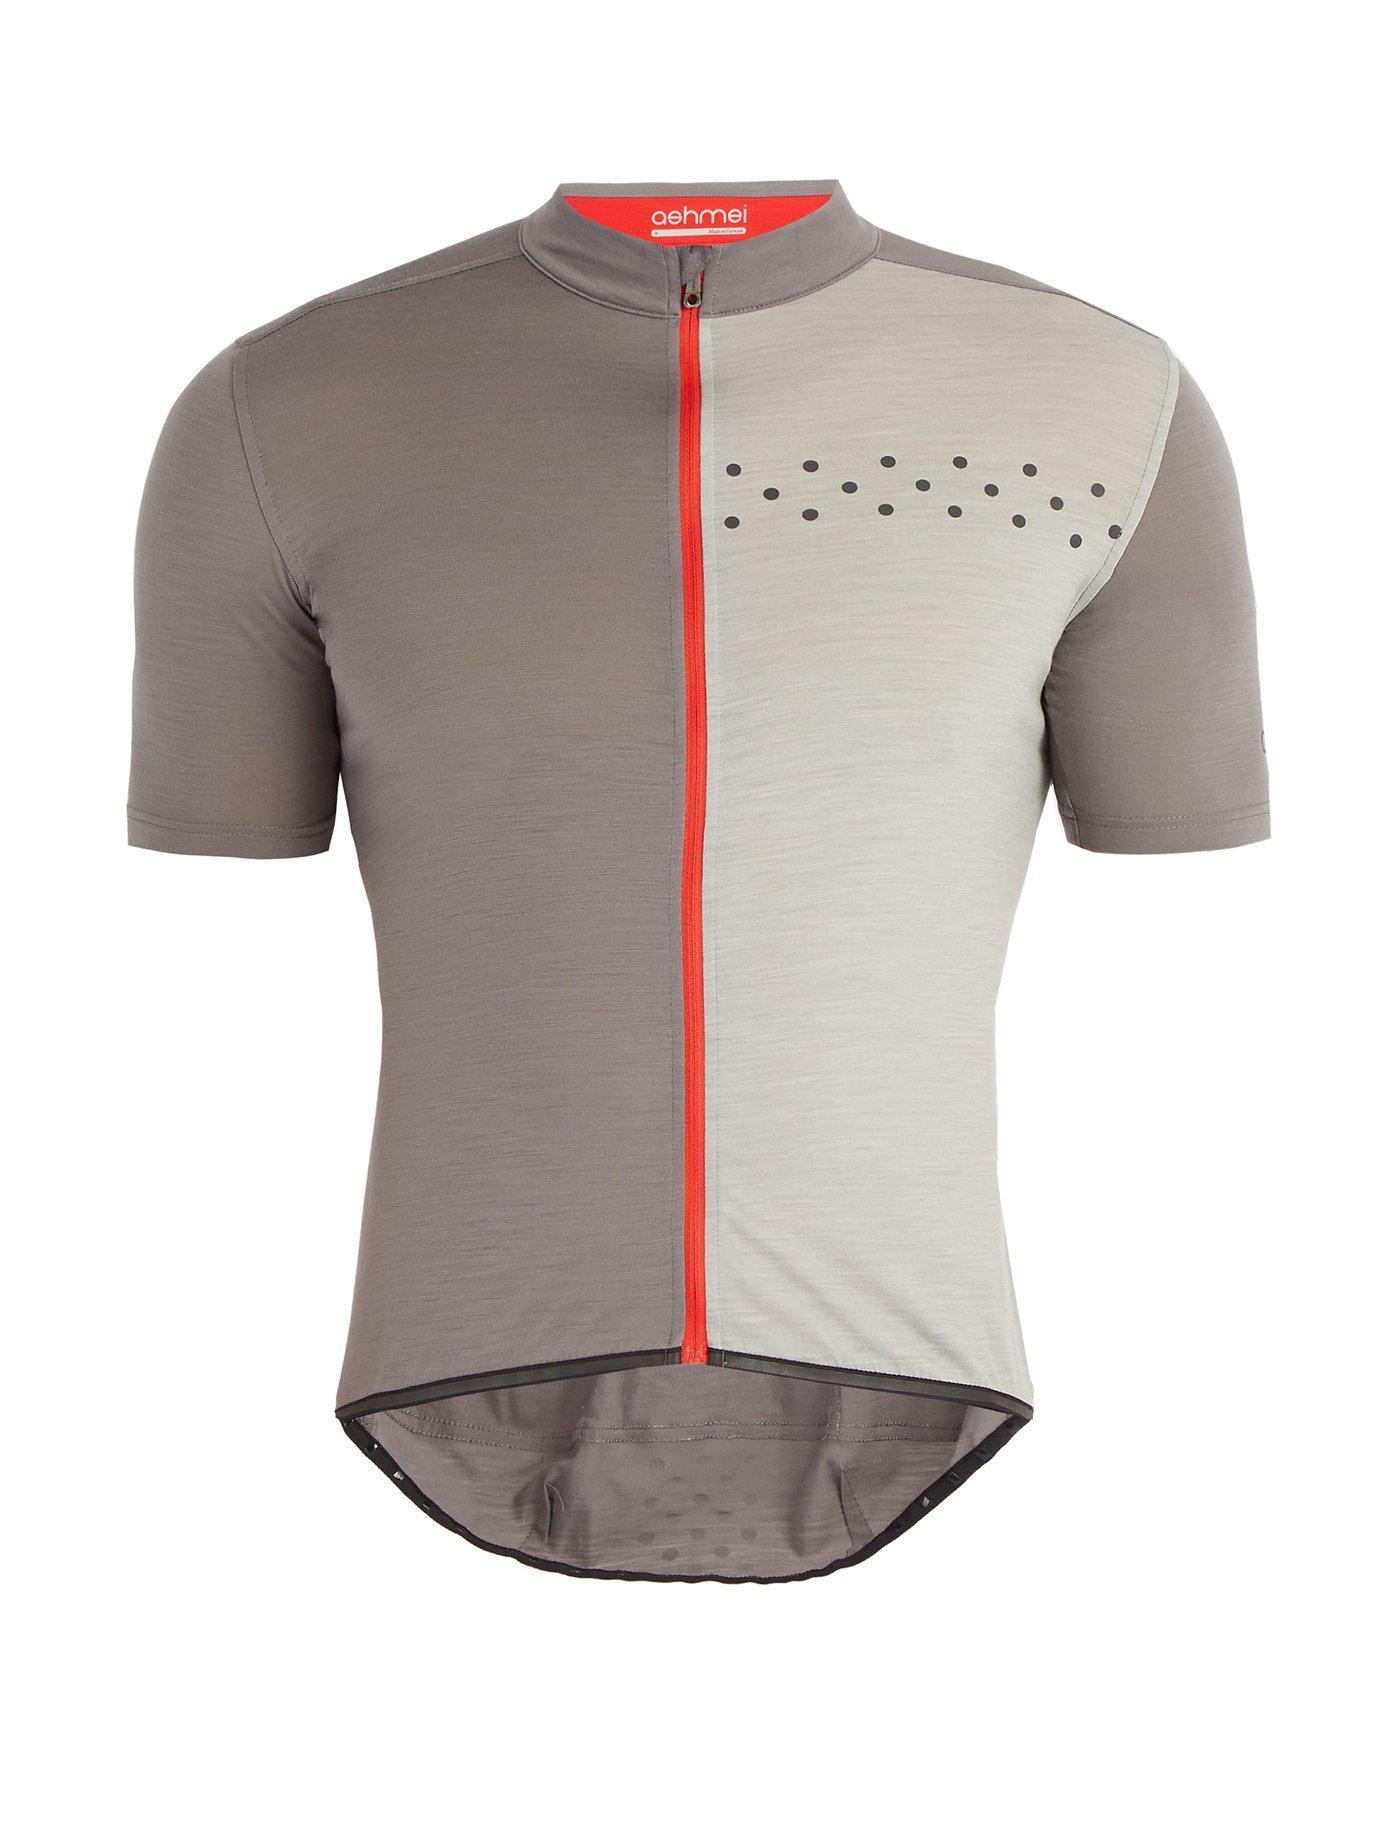 Ashmei - Gray Kom Technical Cycling Jersey for Men - Lyst. View fullscreen 16c6eea3f